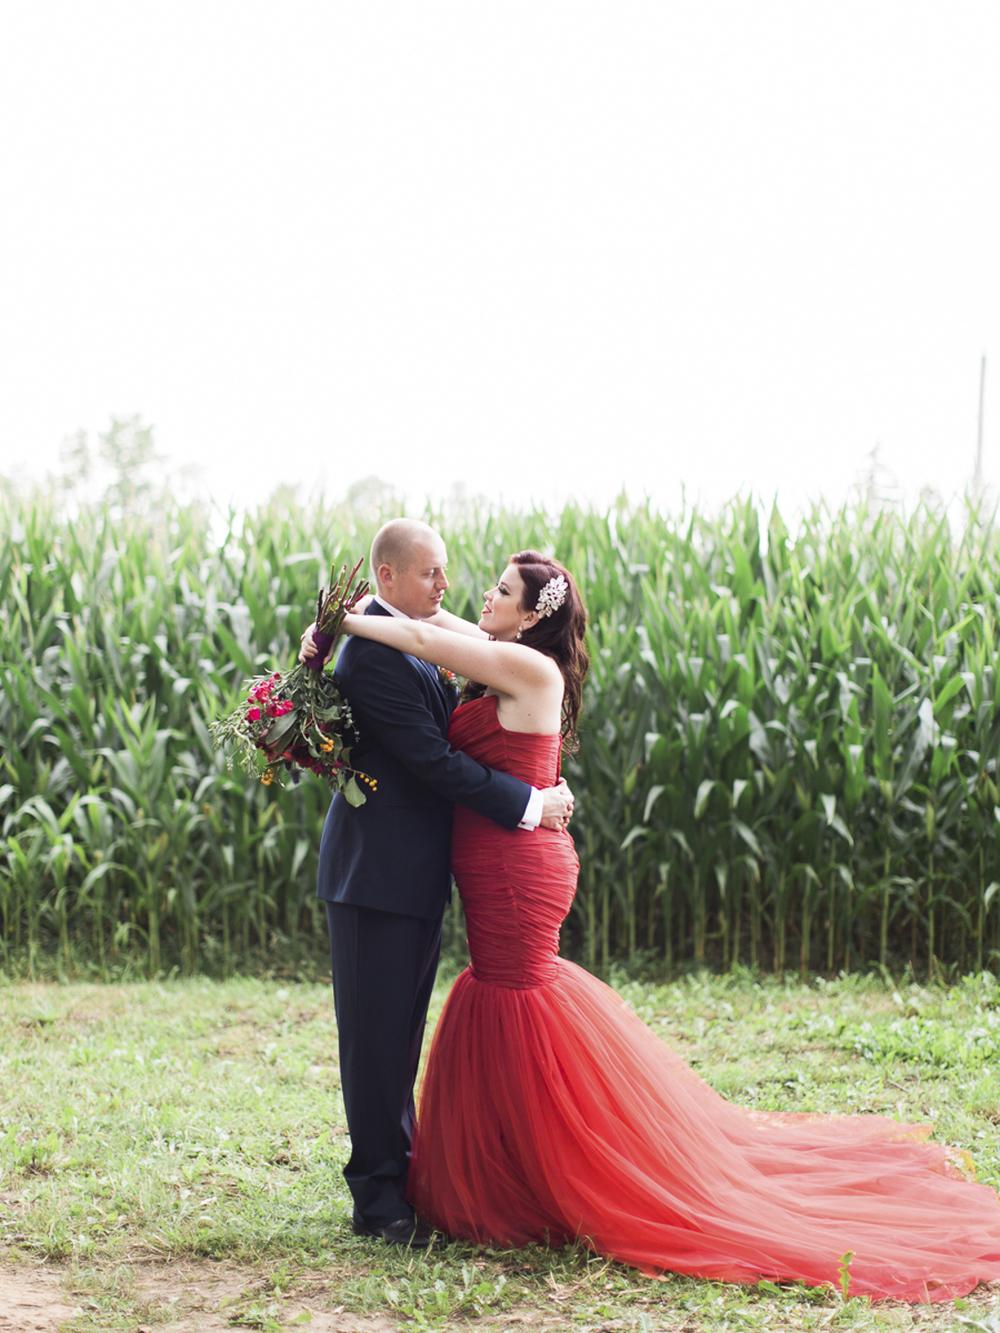 Waterdown-Backyard-Wedding-Blair-Matt-photography-by-Kurtz-Orpia015.jpg